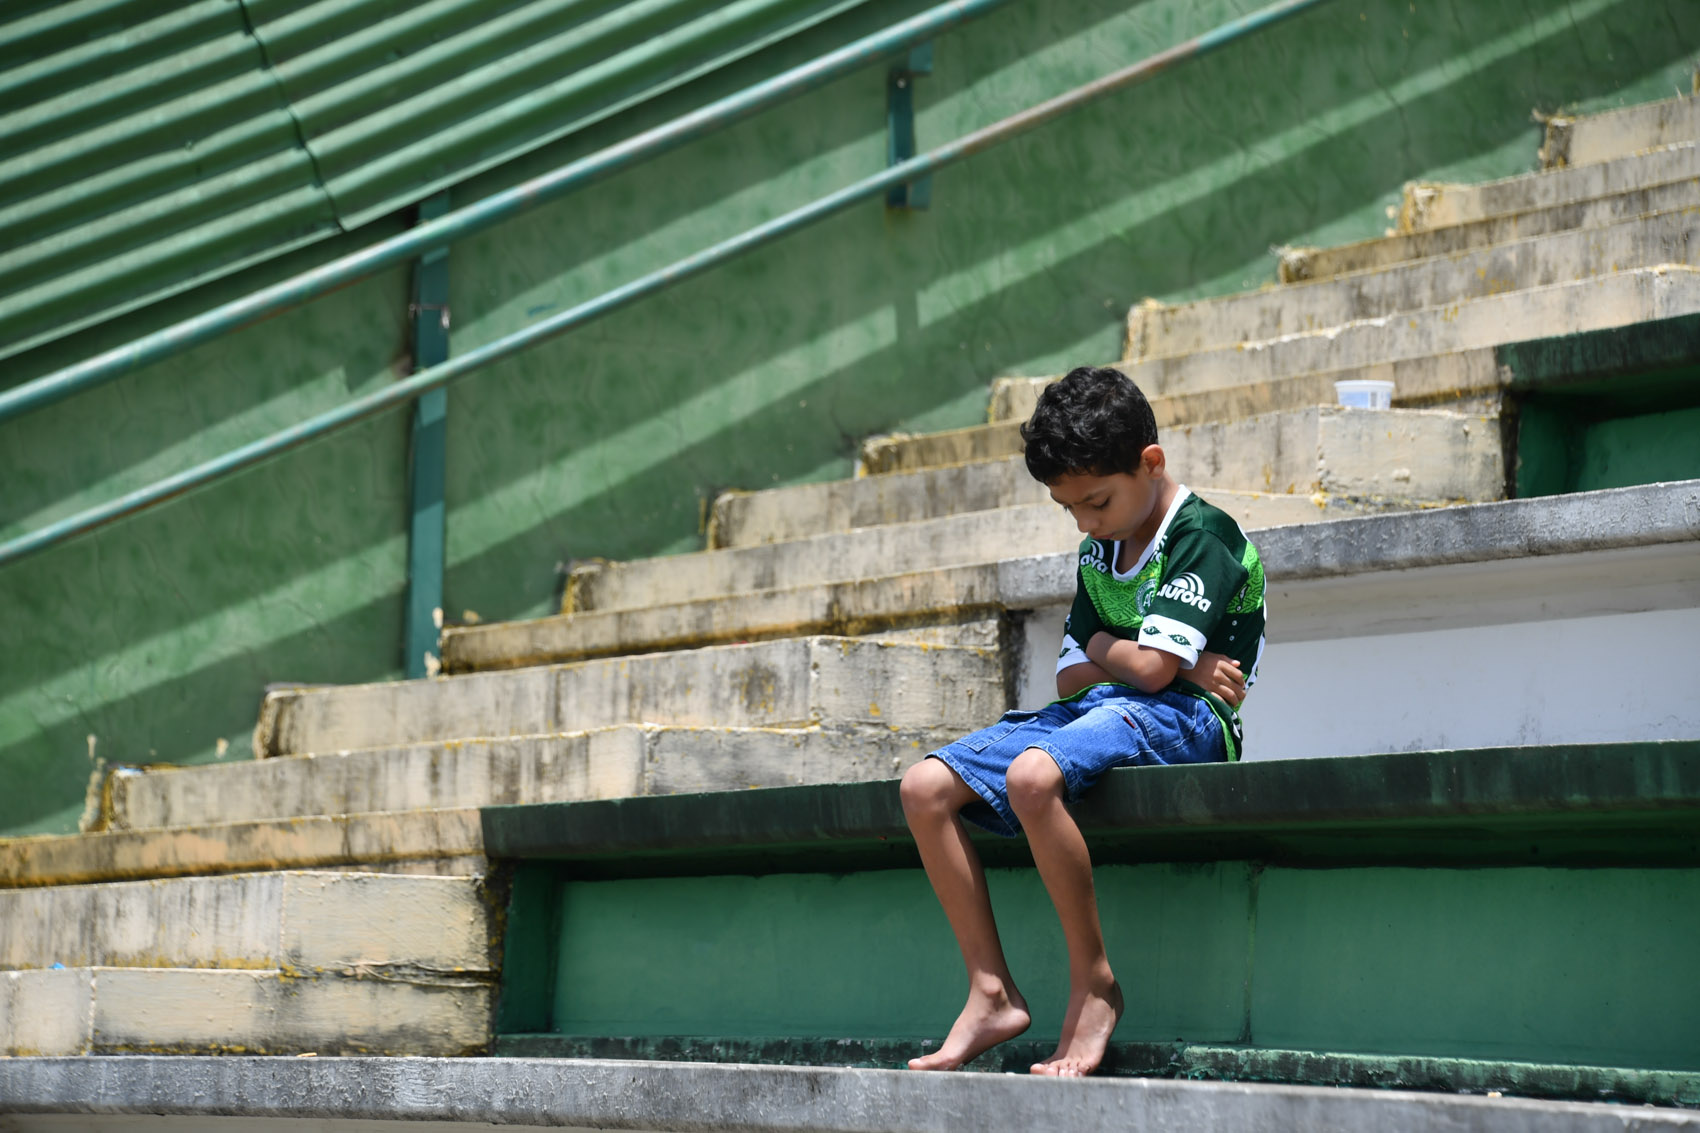 (Foto: Nelson Almeida /AFP News Agency)